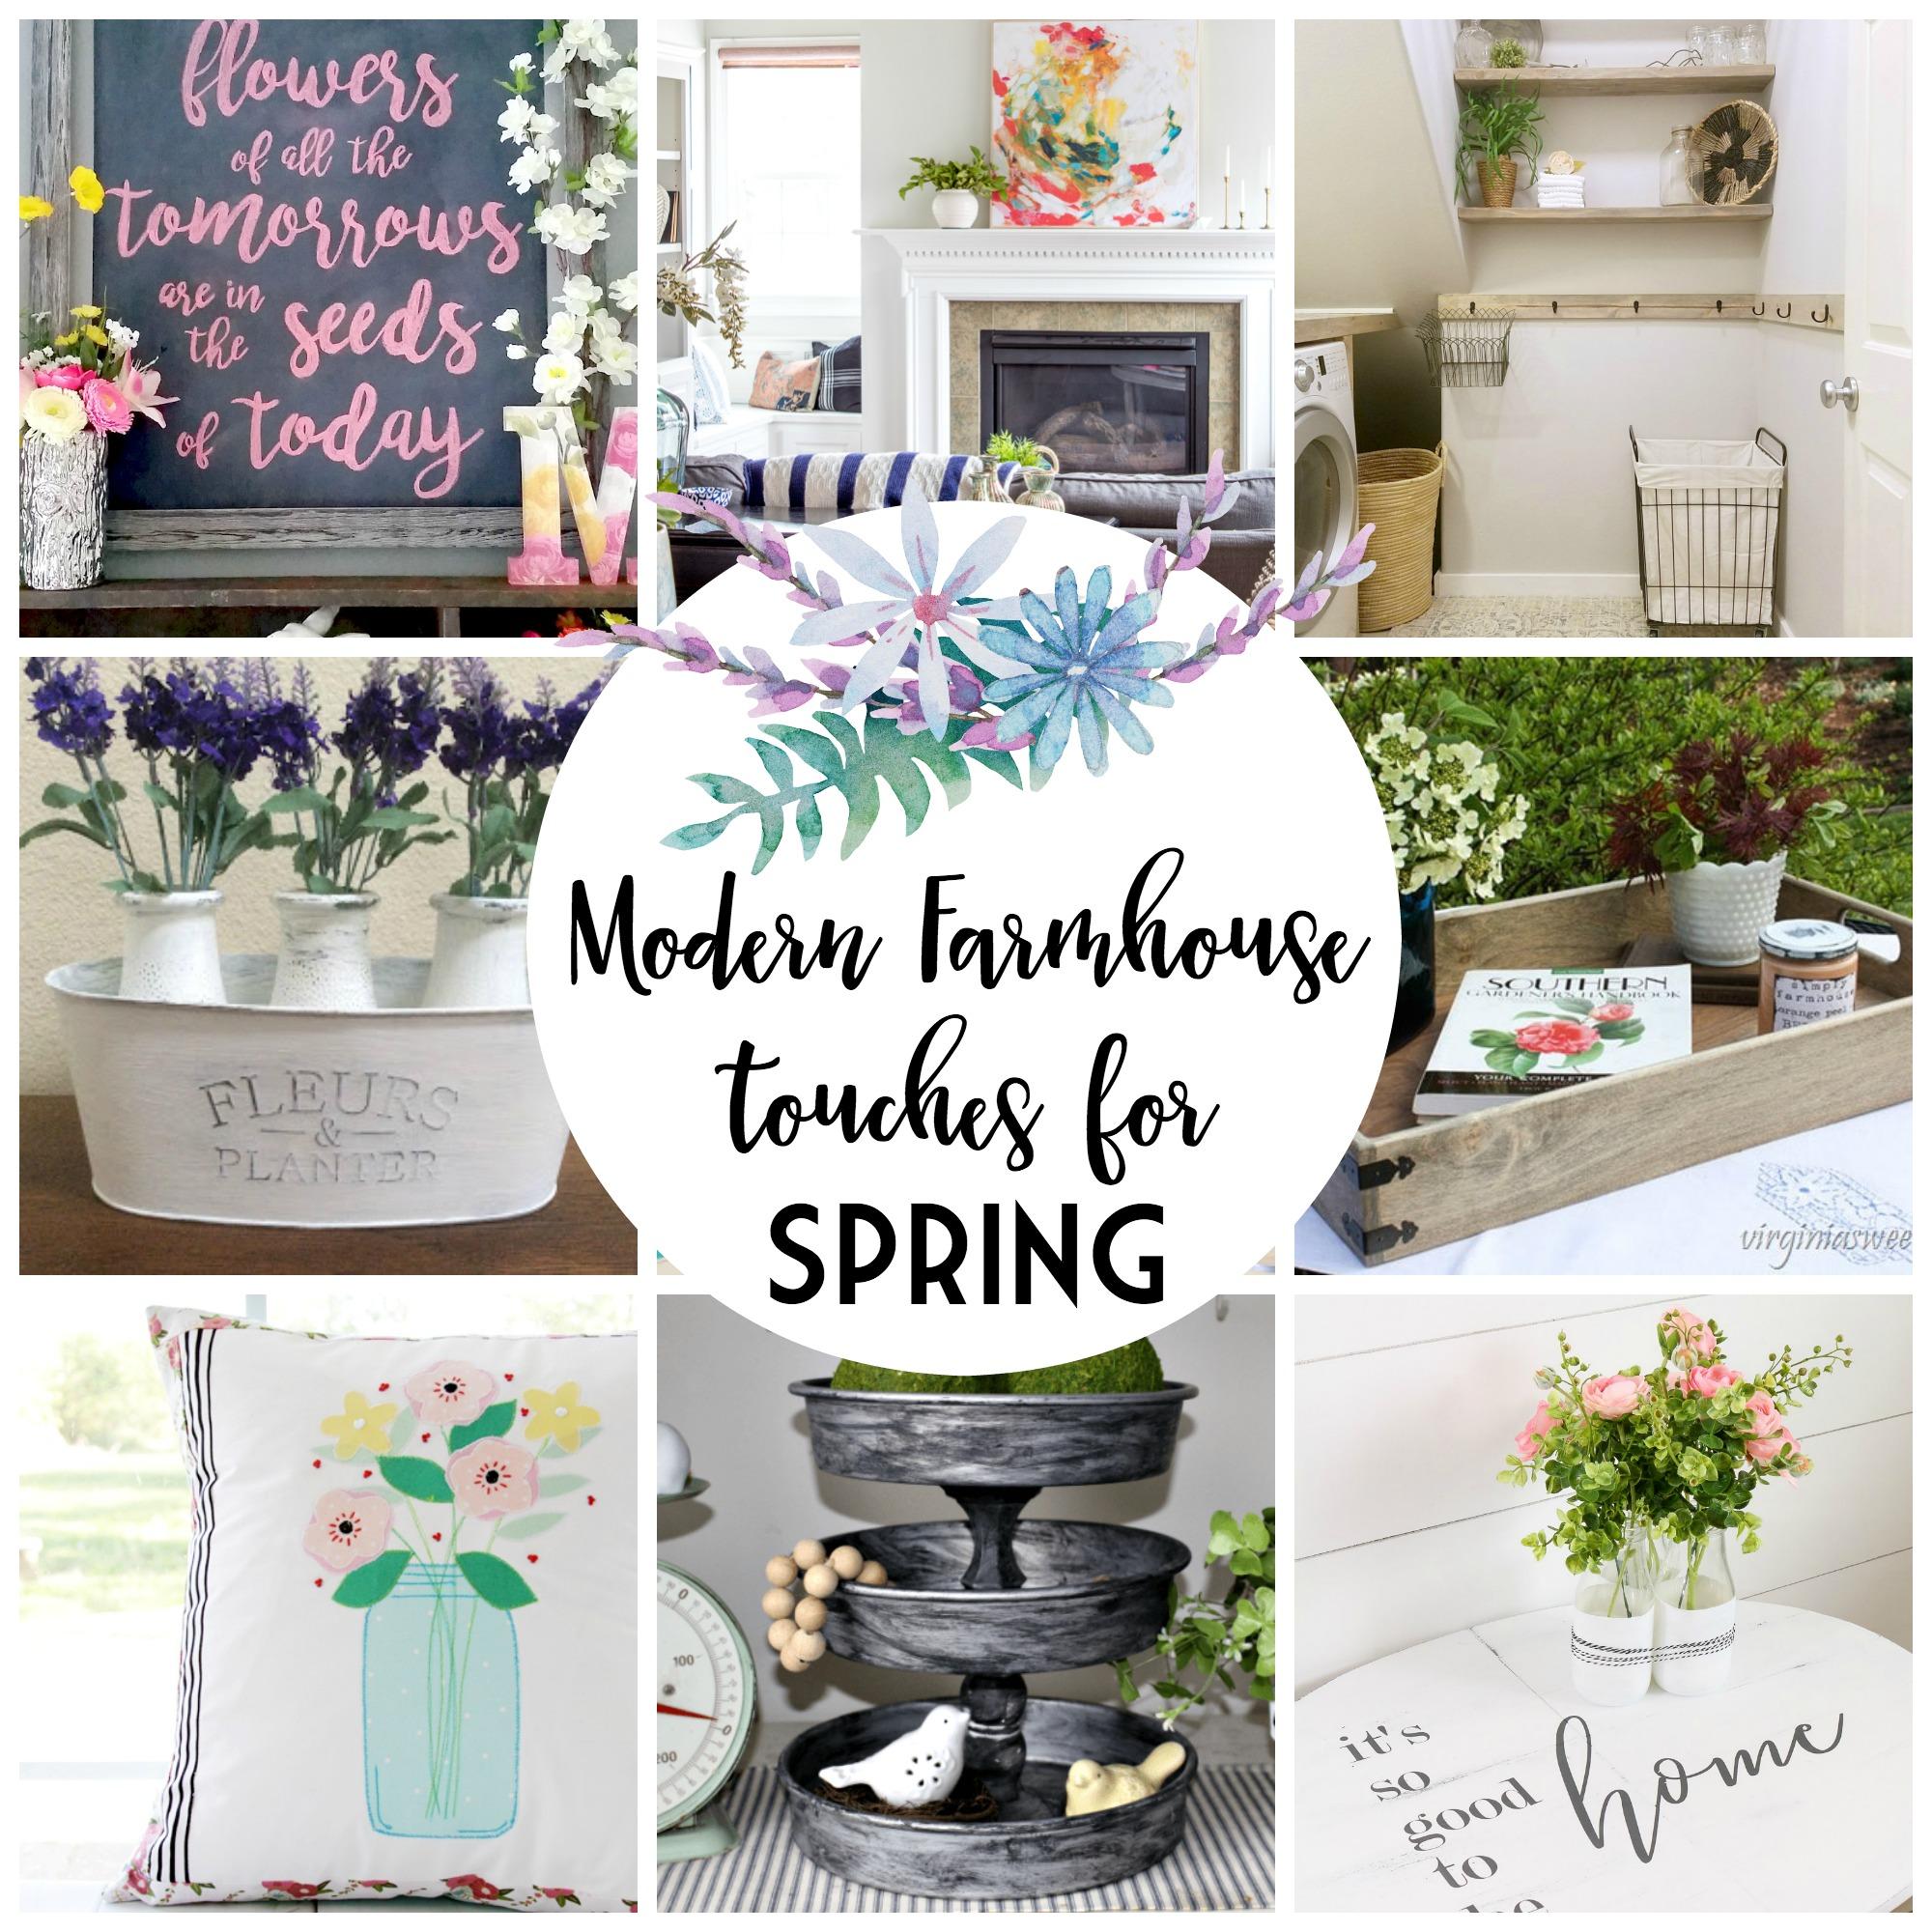 Modern Farmhouse Touches for Spring